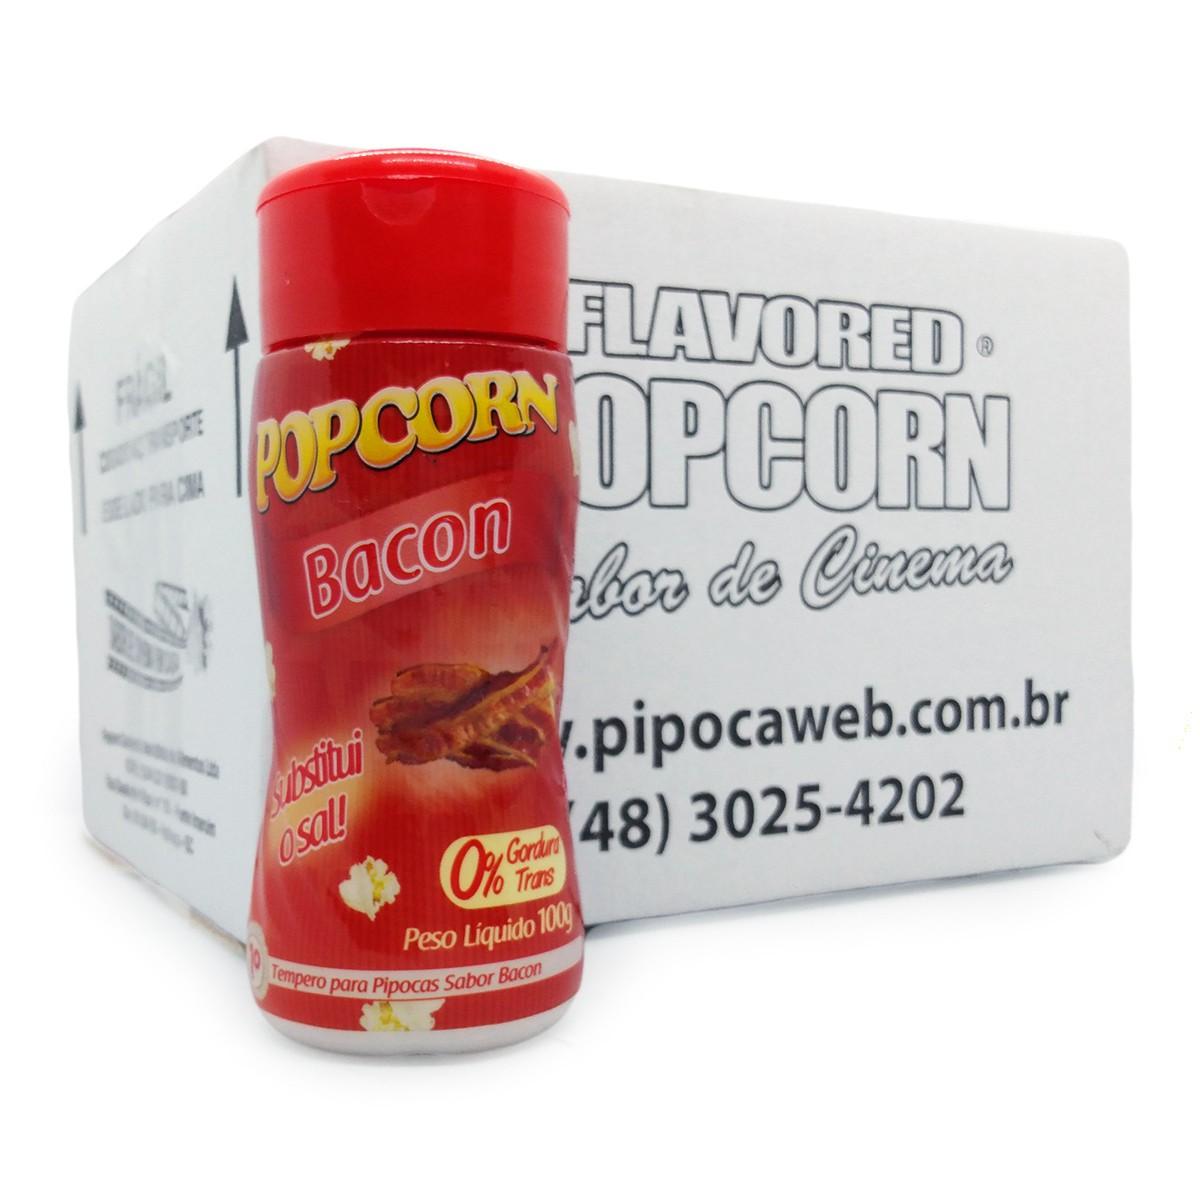 TEMPEROS P/ PIPOCA POPCORN - 21 Sabores - Escolha seu Sabor - Caixa c/ 24 Frascos 100g - Atacado